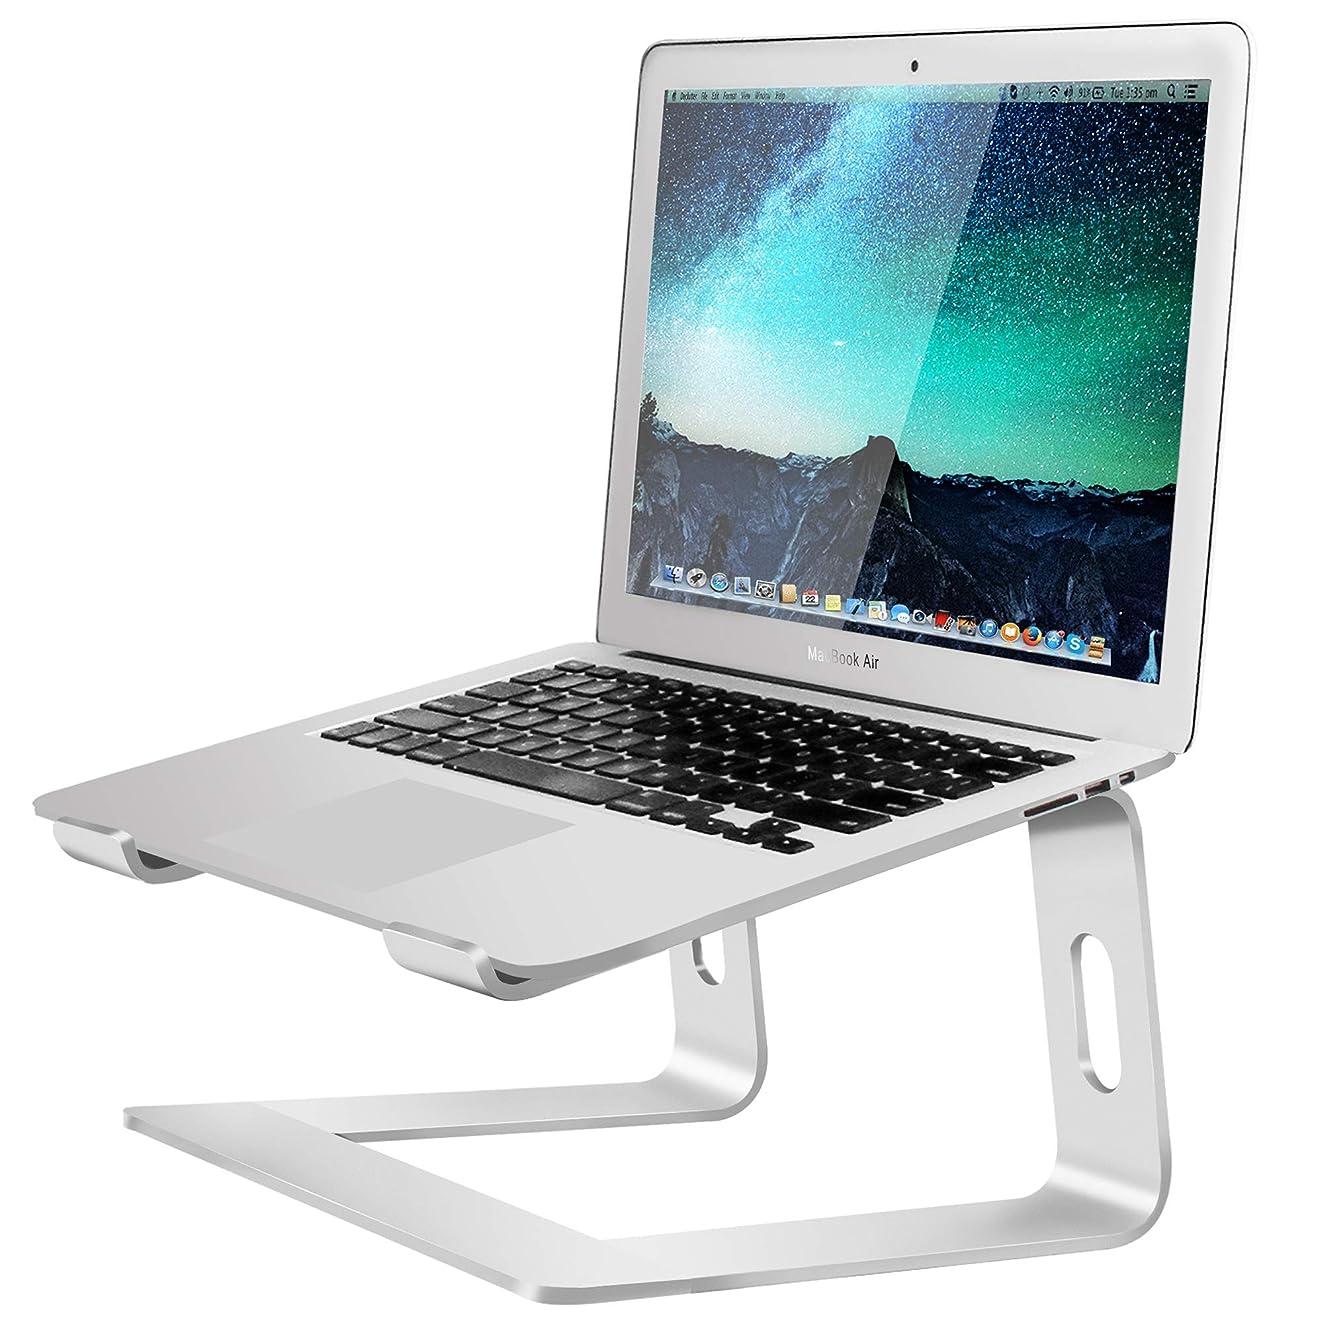 Soundance Aluminum Laptop Stand for Desk Compatible with Mac MacBook Pro/Air Apple 12